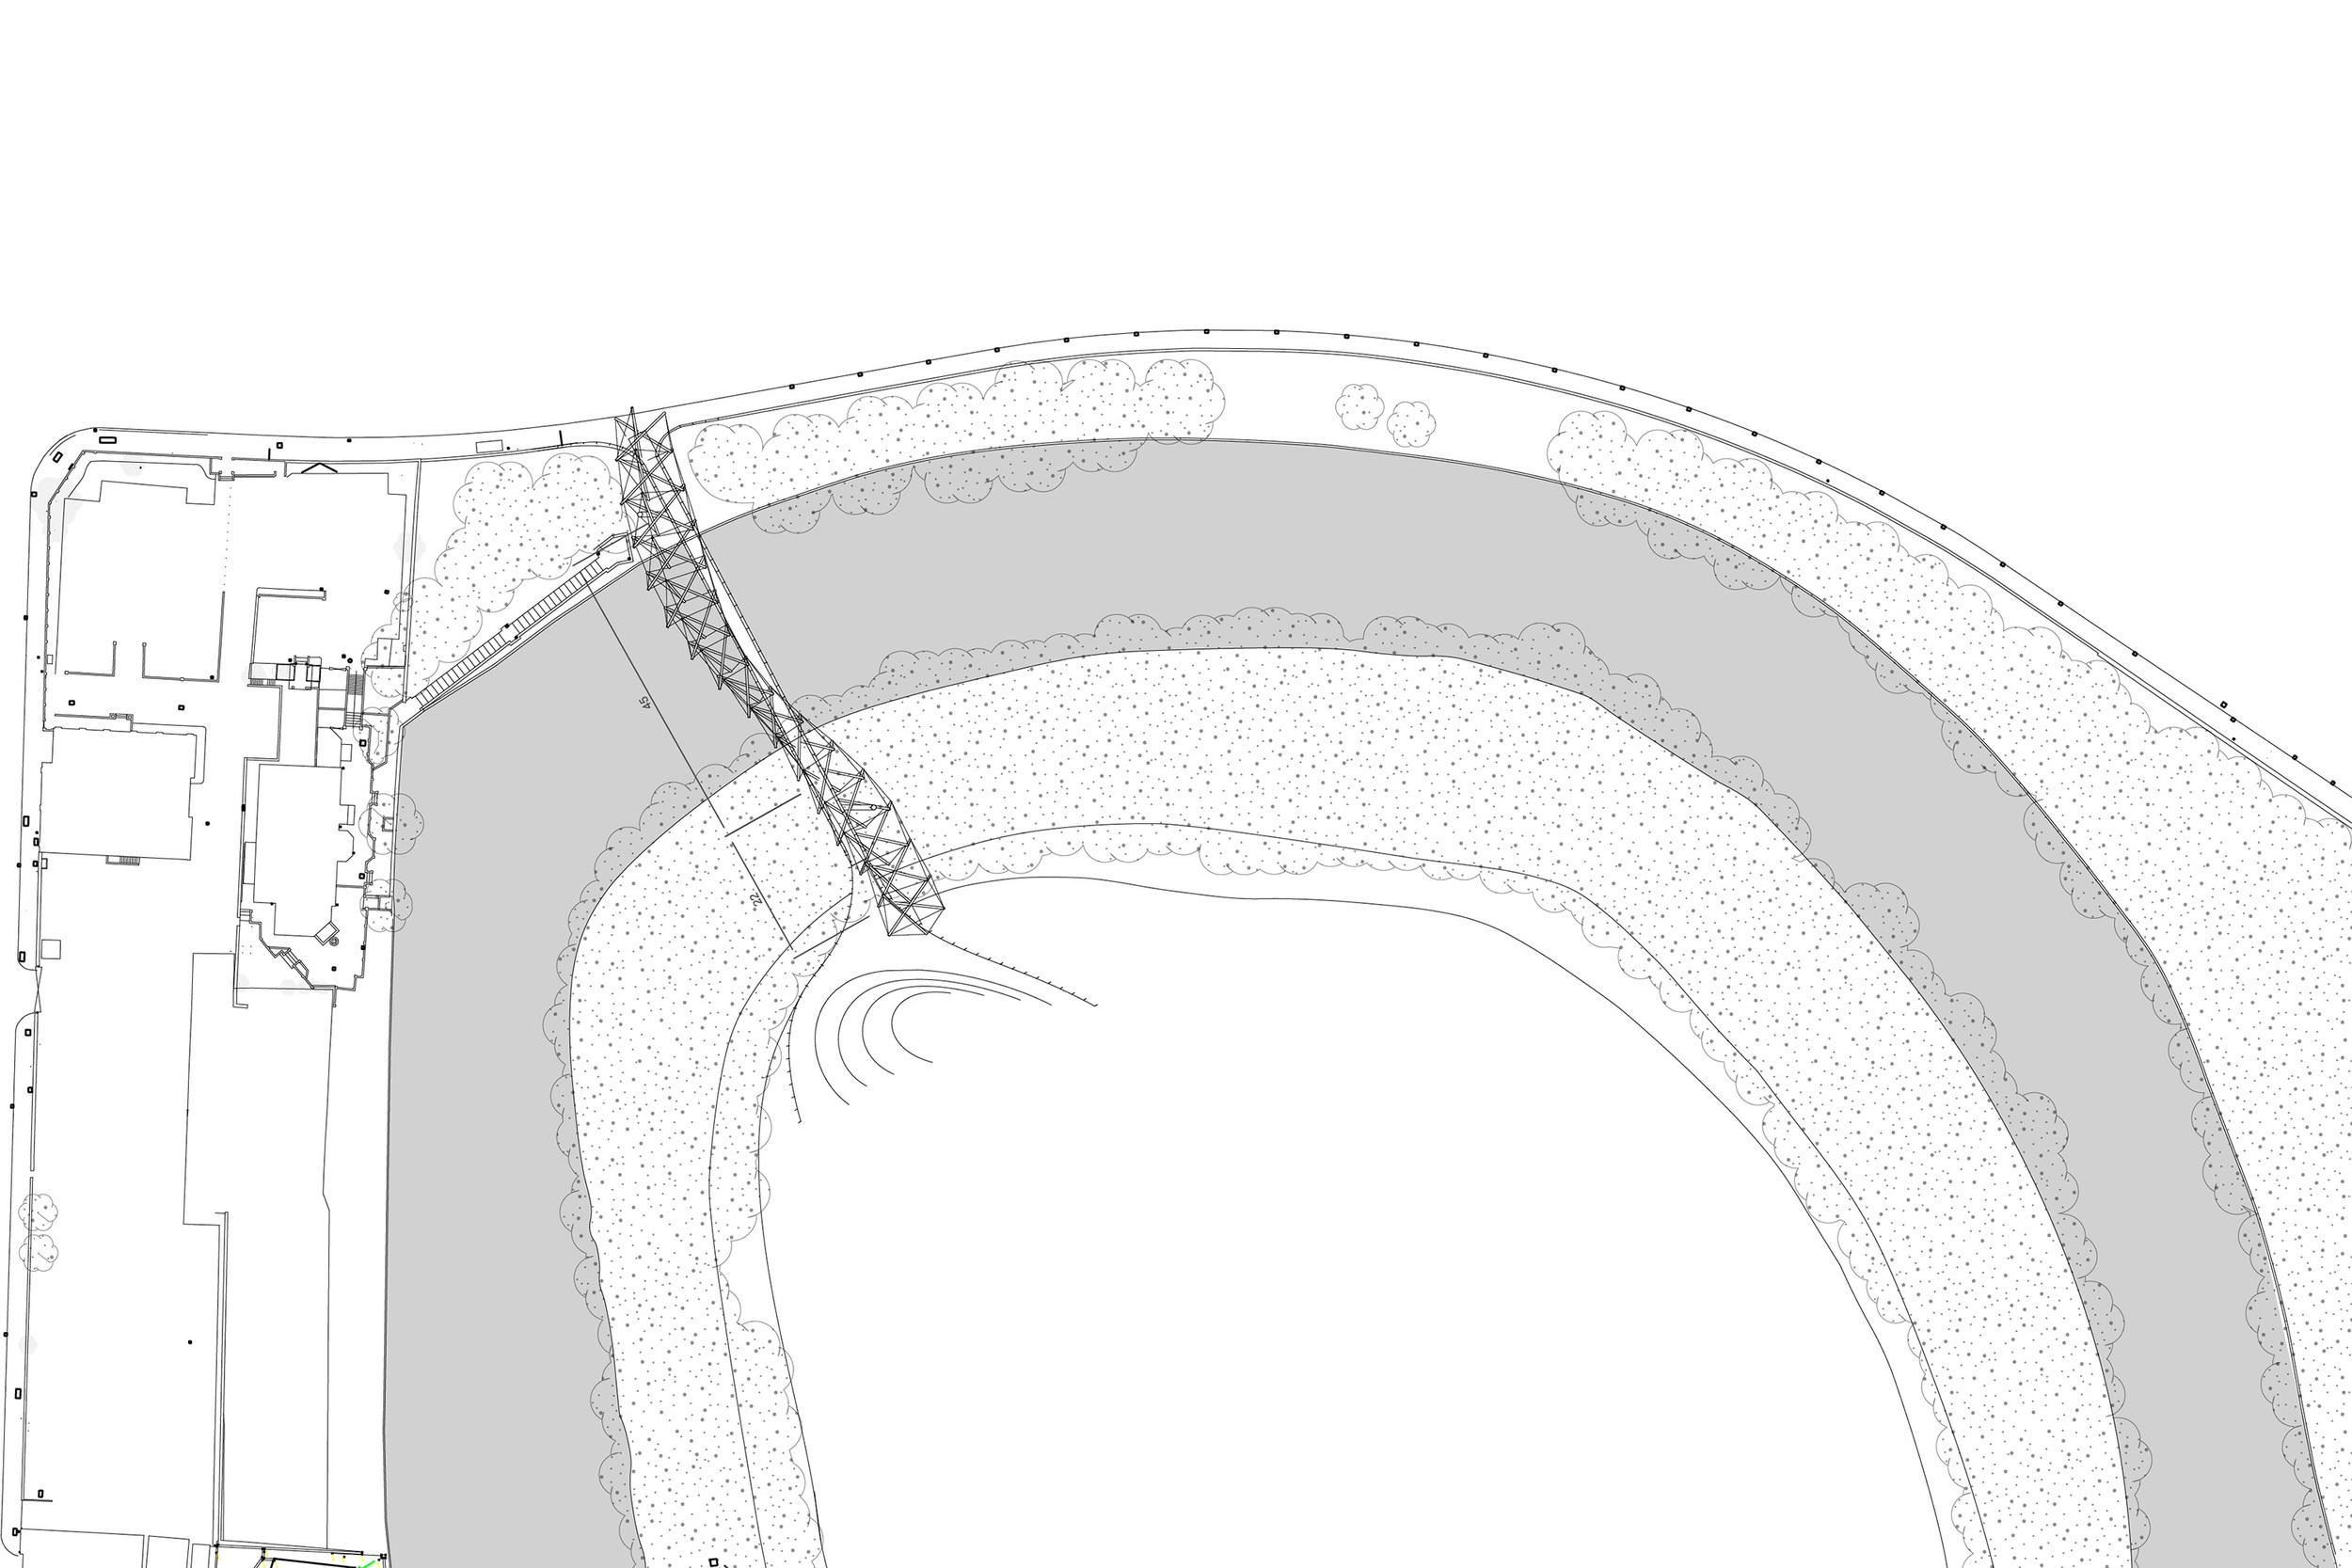 062_Tensegrity Bridge-site plan.jpg